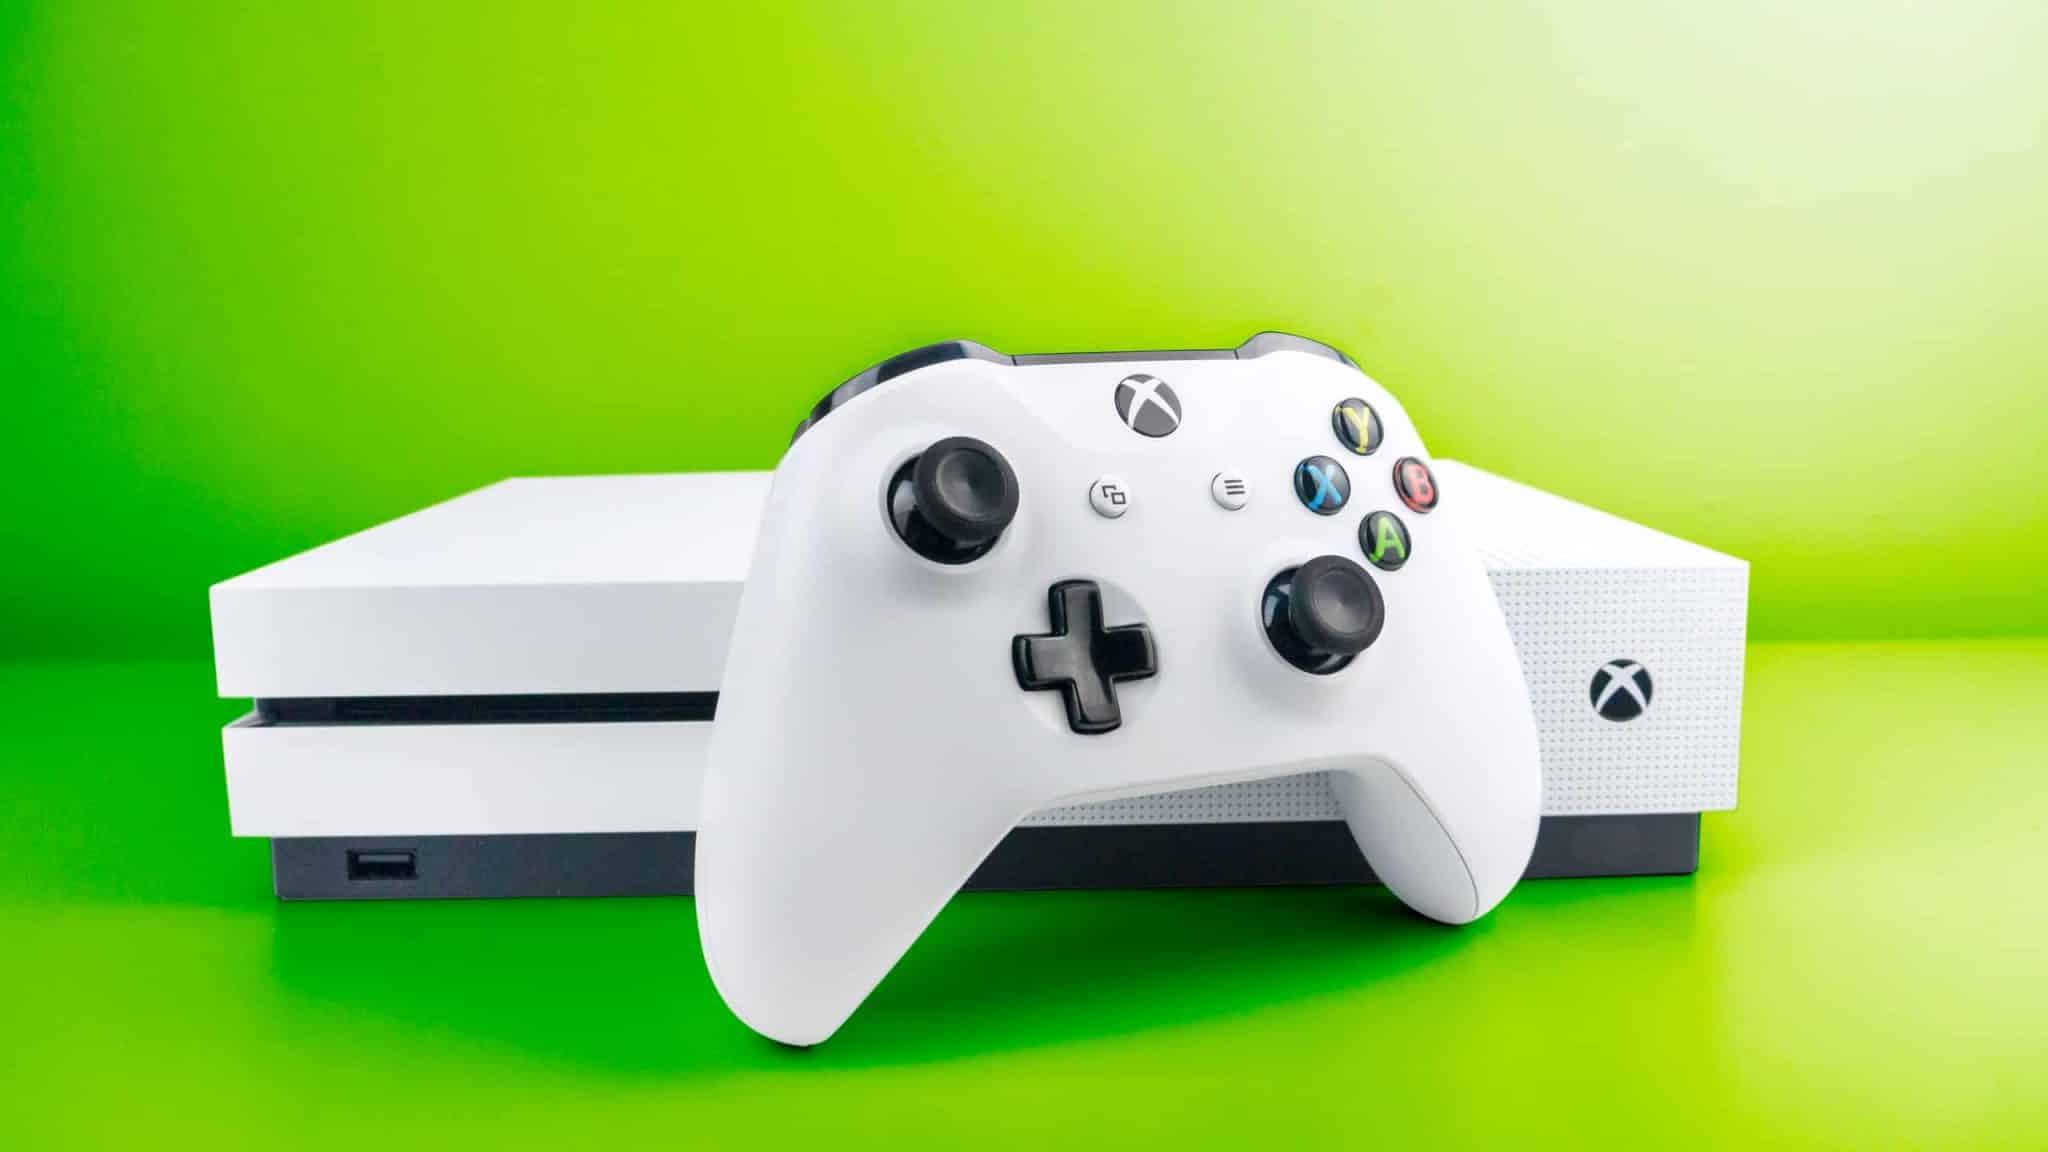 Giochi Gratis e tanti sconti per Xbox con Free Play Days thumbnail